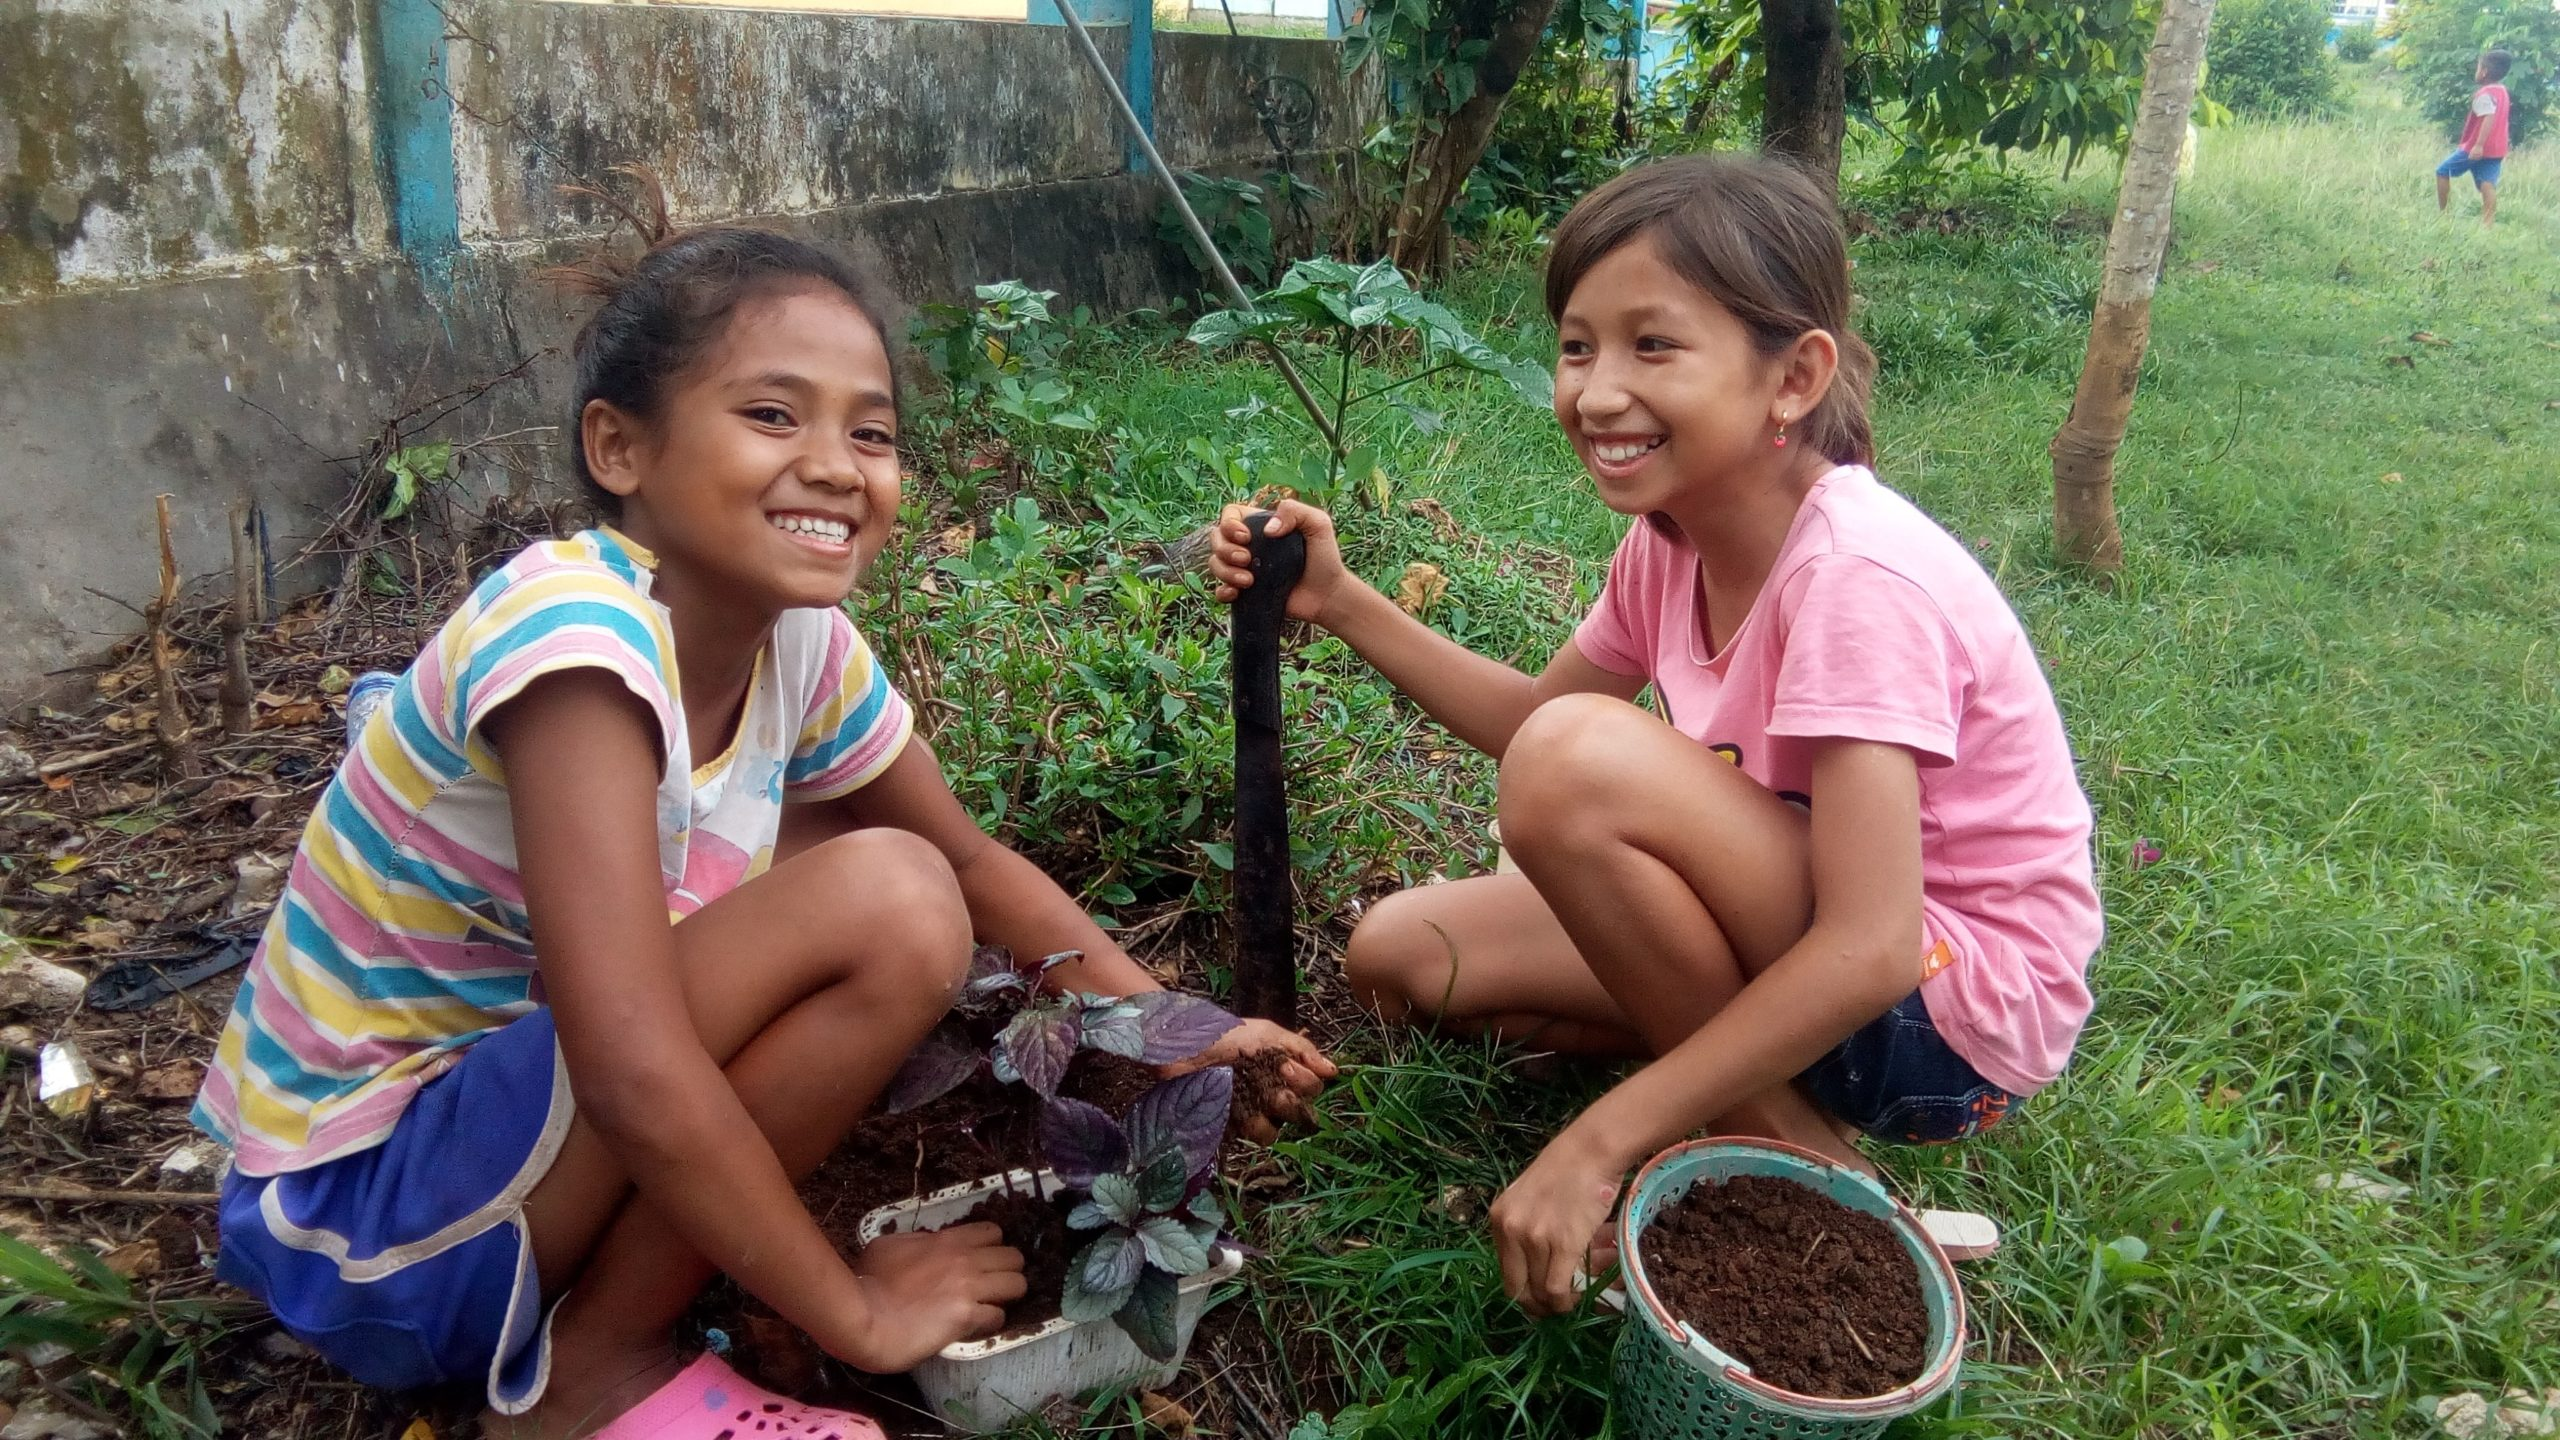 East_Timor_Tom_Liddle_IMG_20171203_160757.jpeg